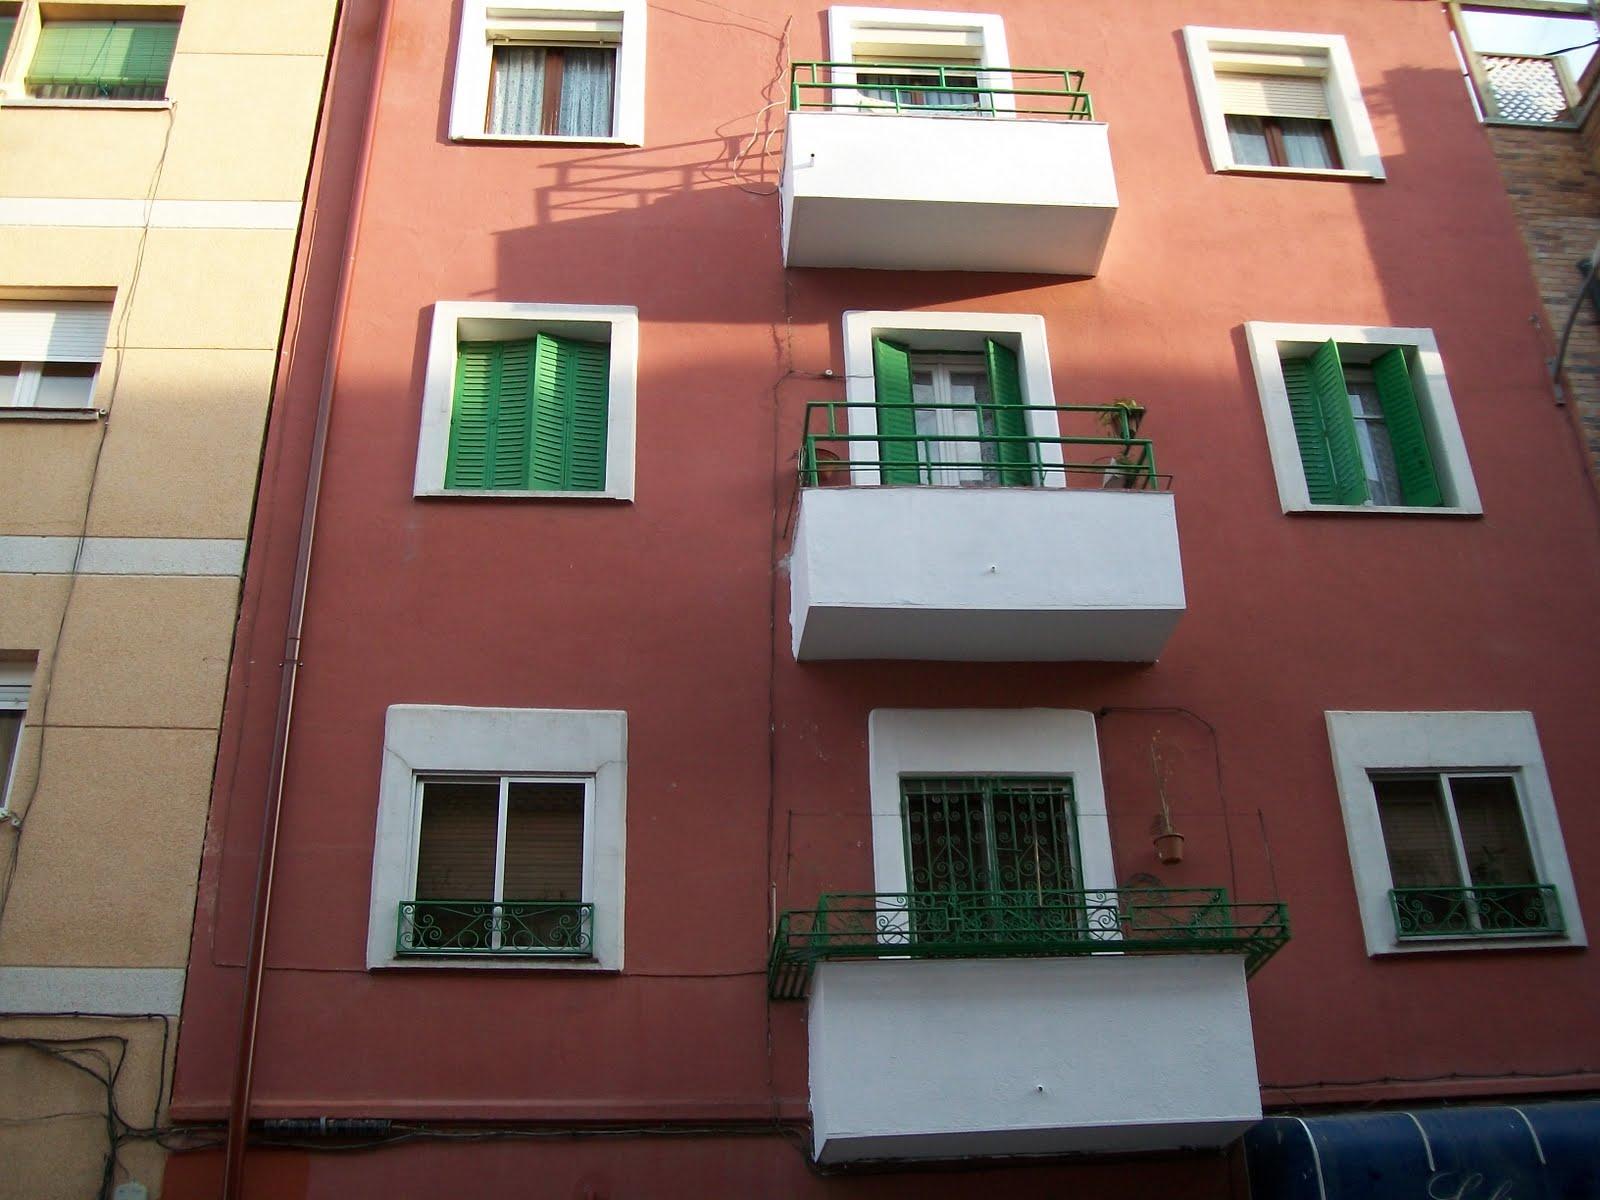 Reparar Balcones Y Terrazas Pintar Enfoscar Enlucir